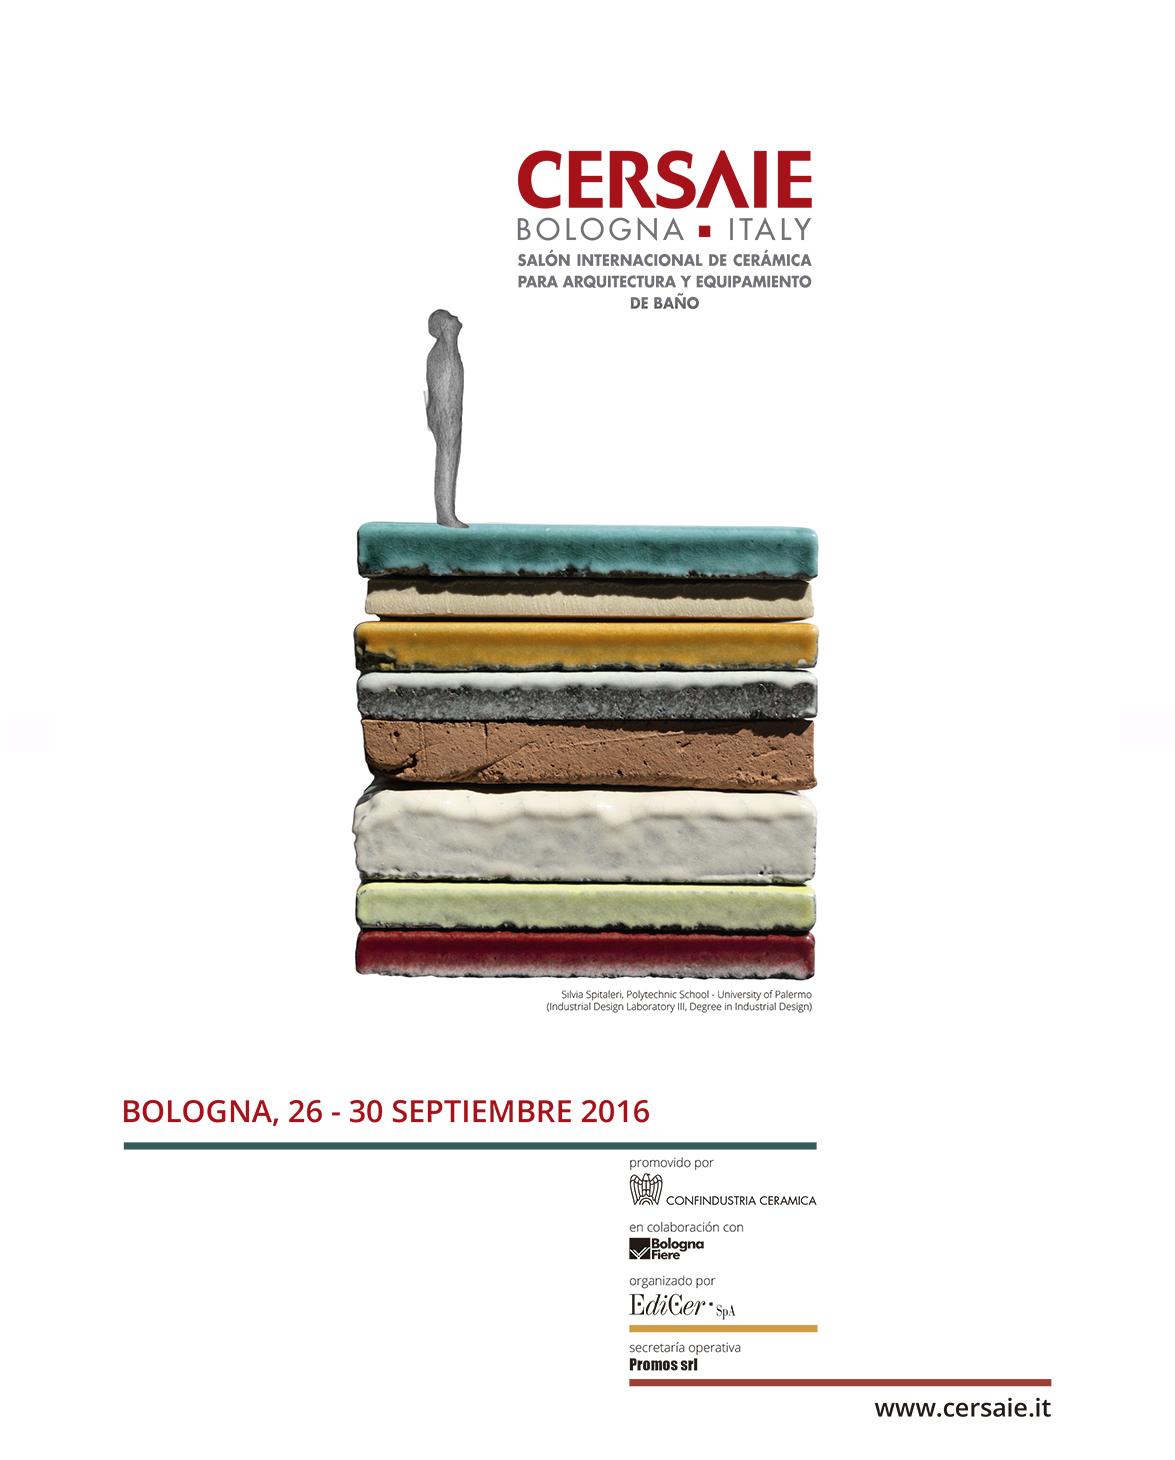 Cersaie-A4-2016-SP_2